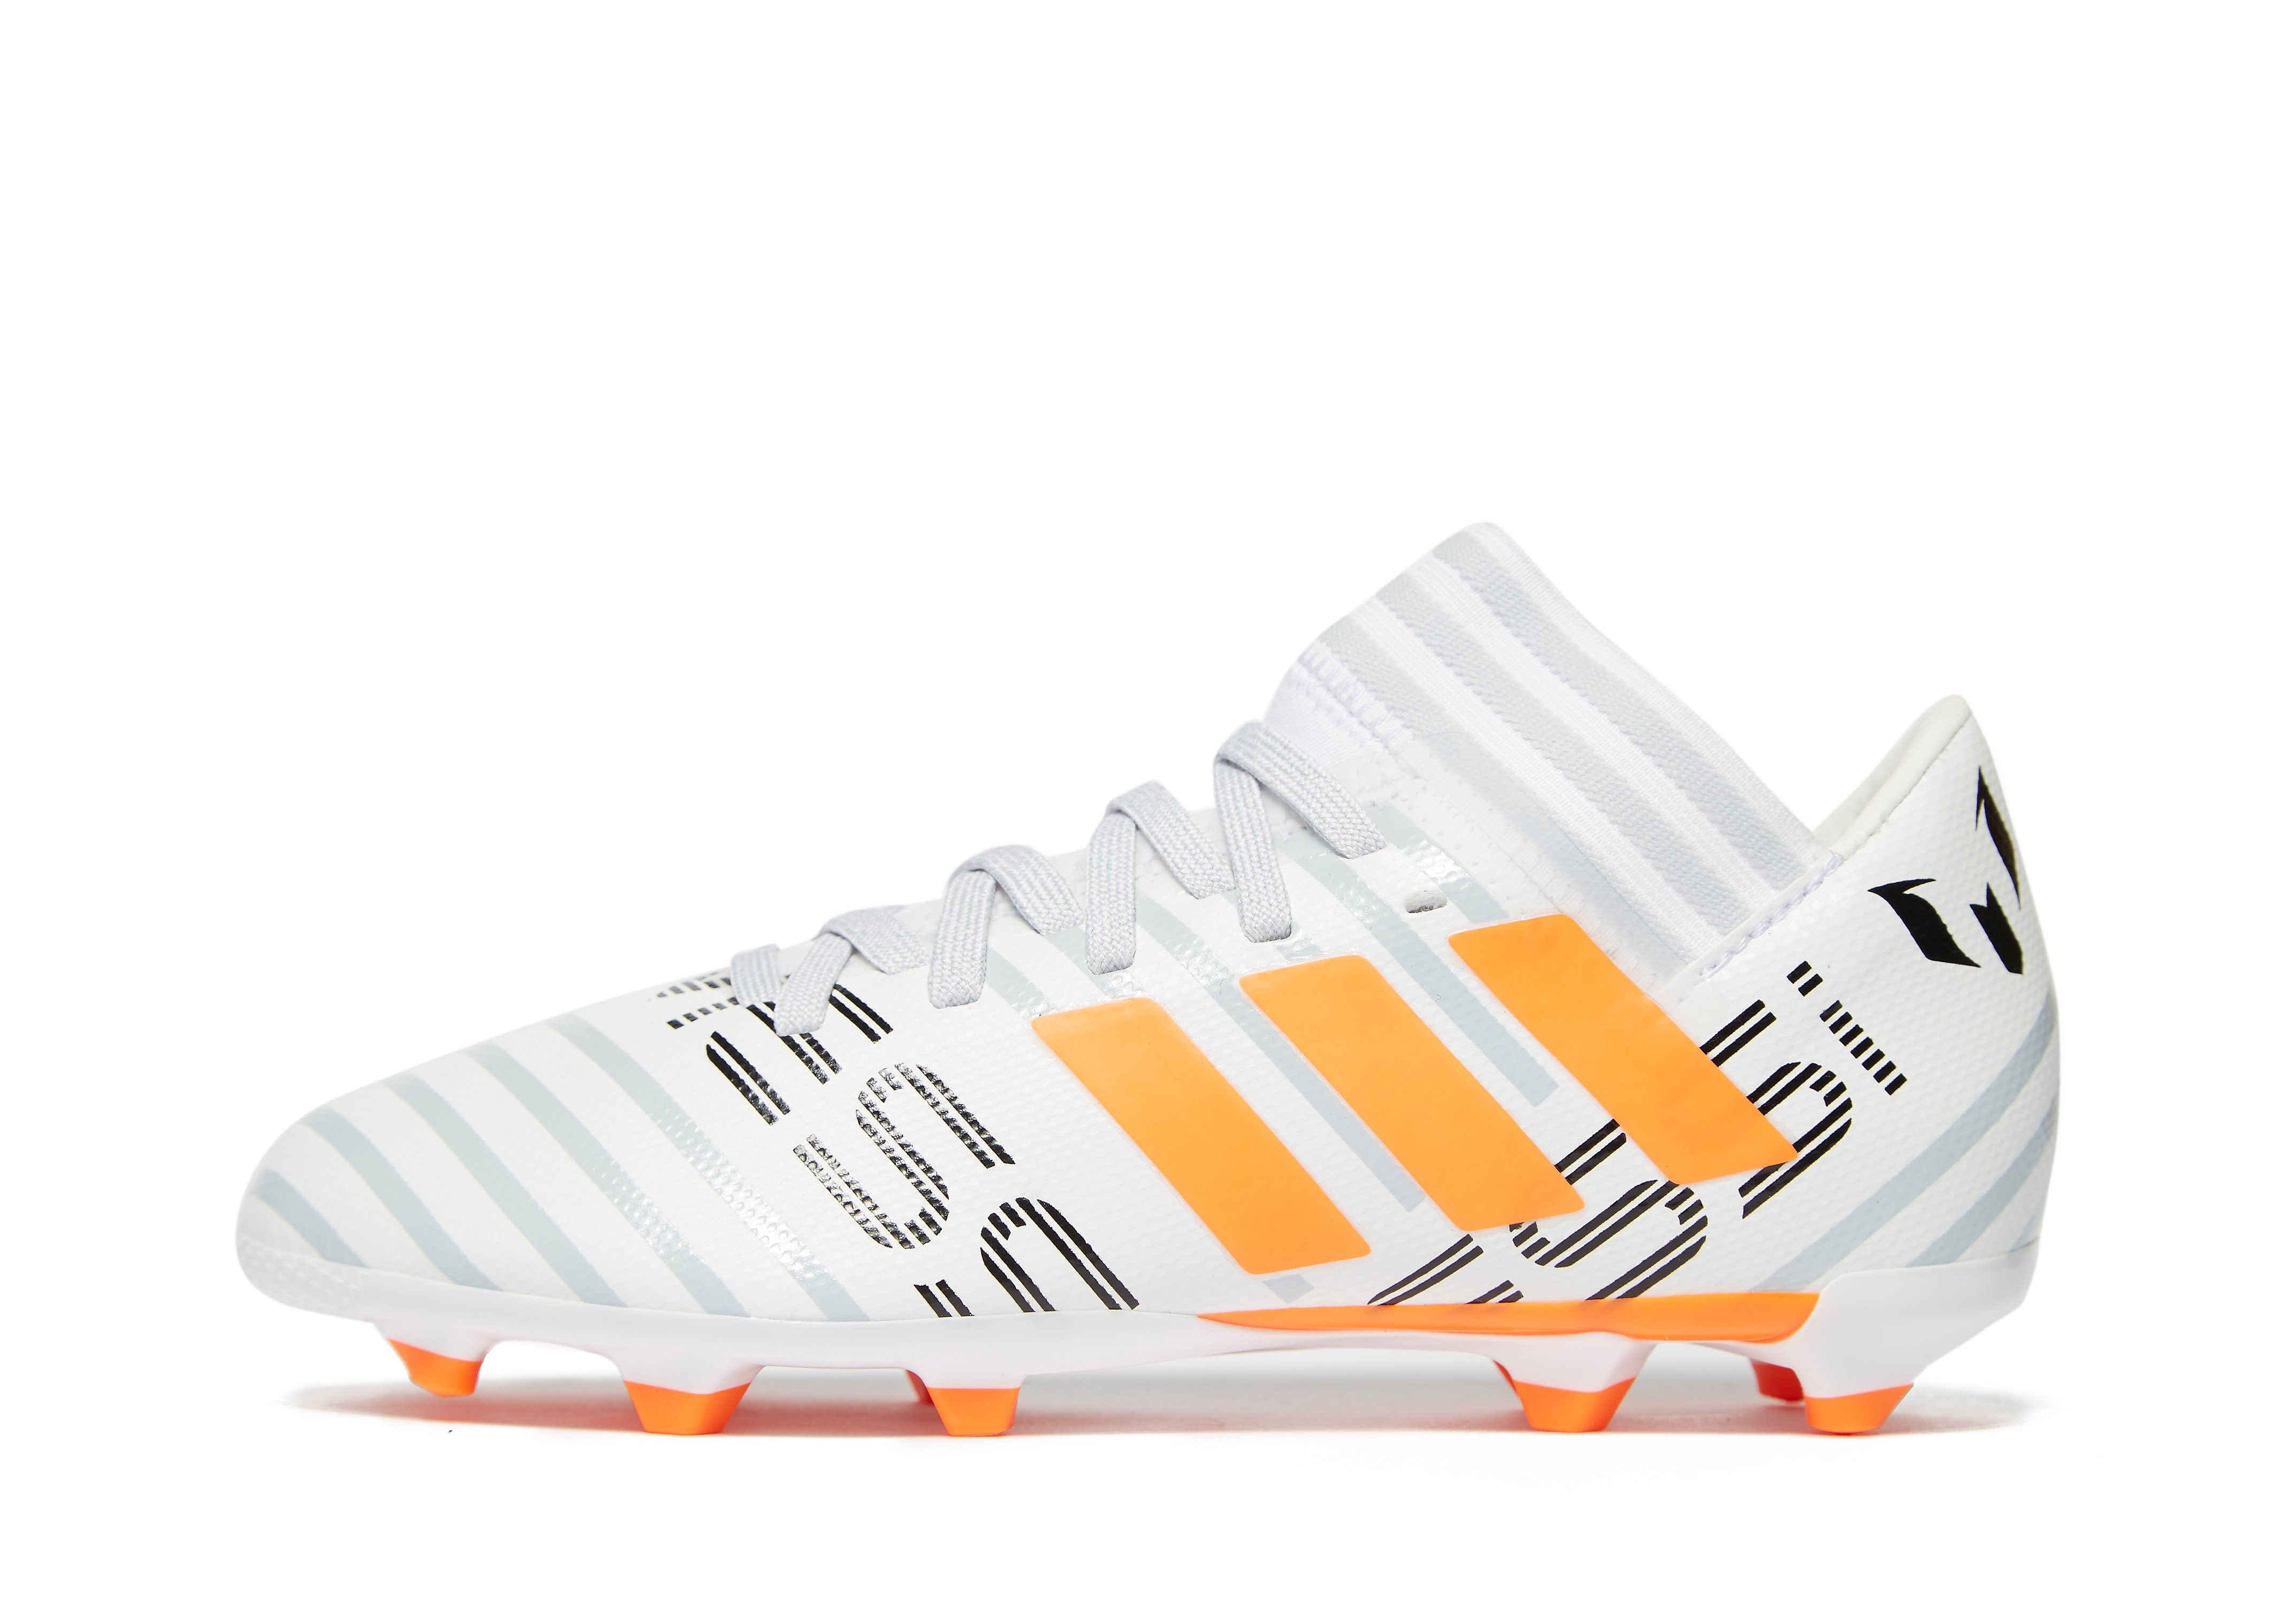 adidas Pyro Storm Nemeziz Messi 17.3 FG Children